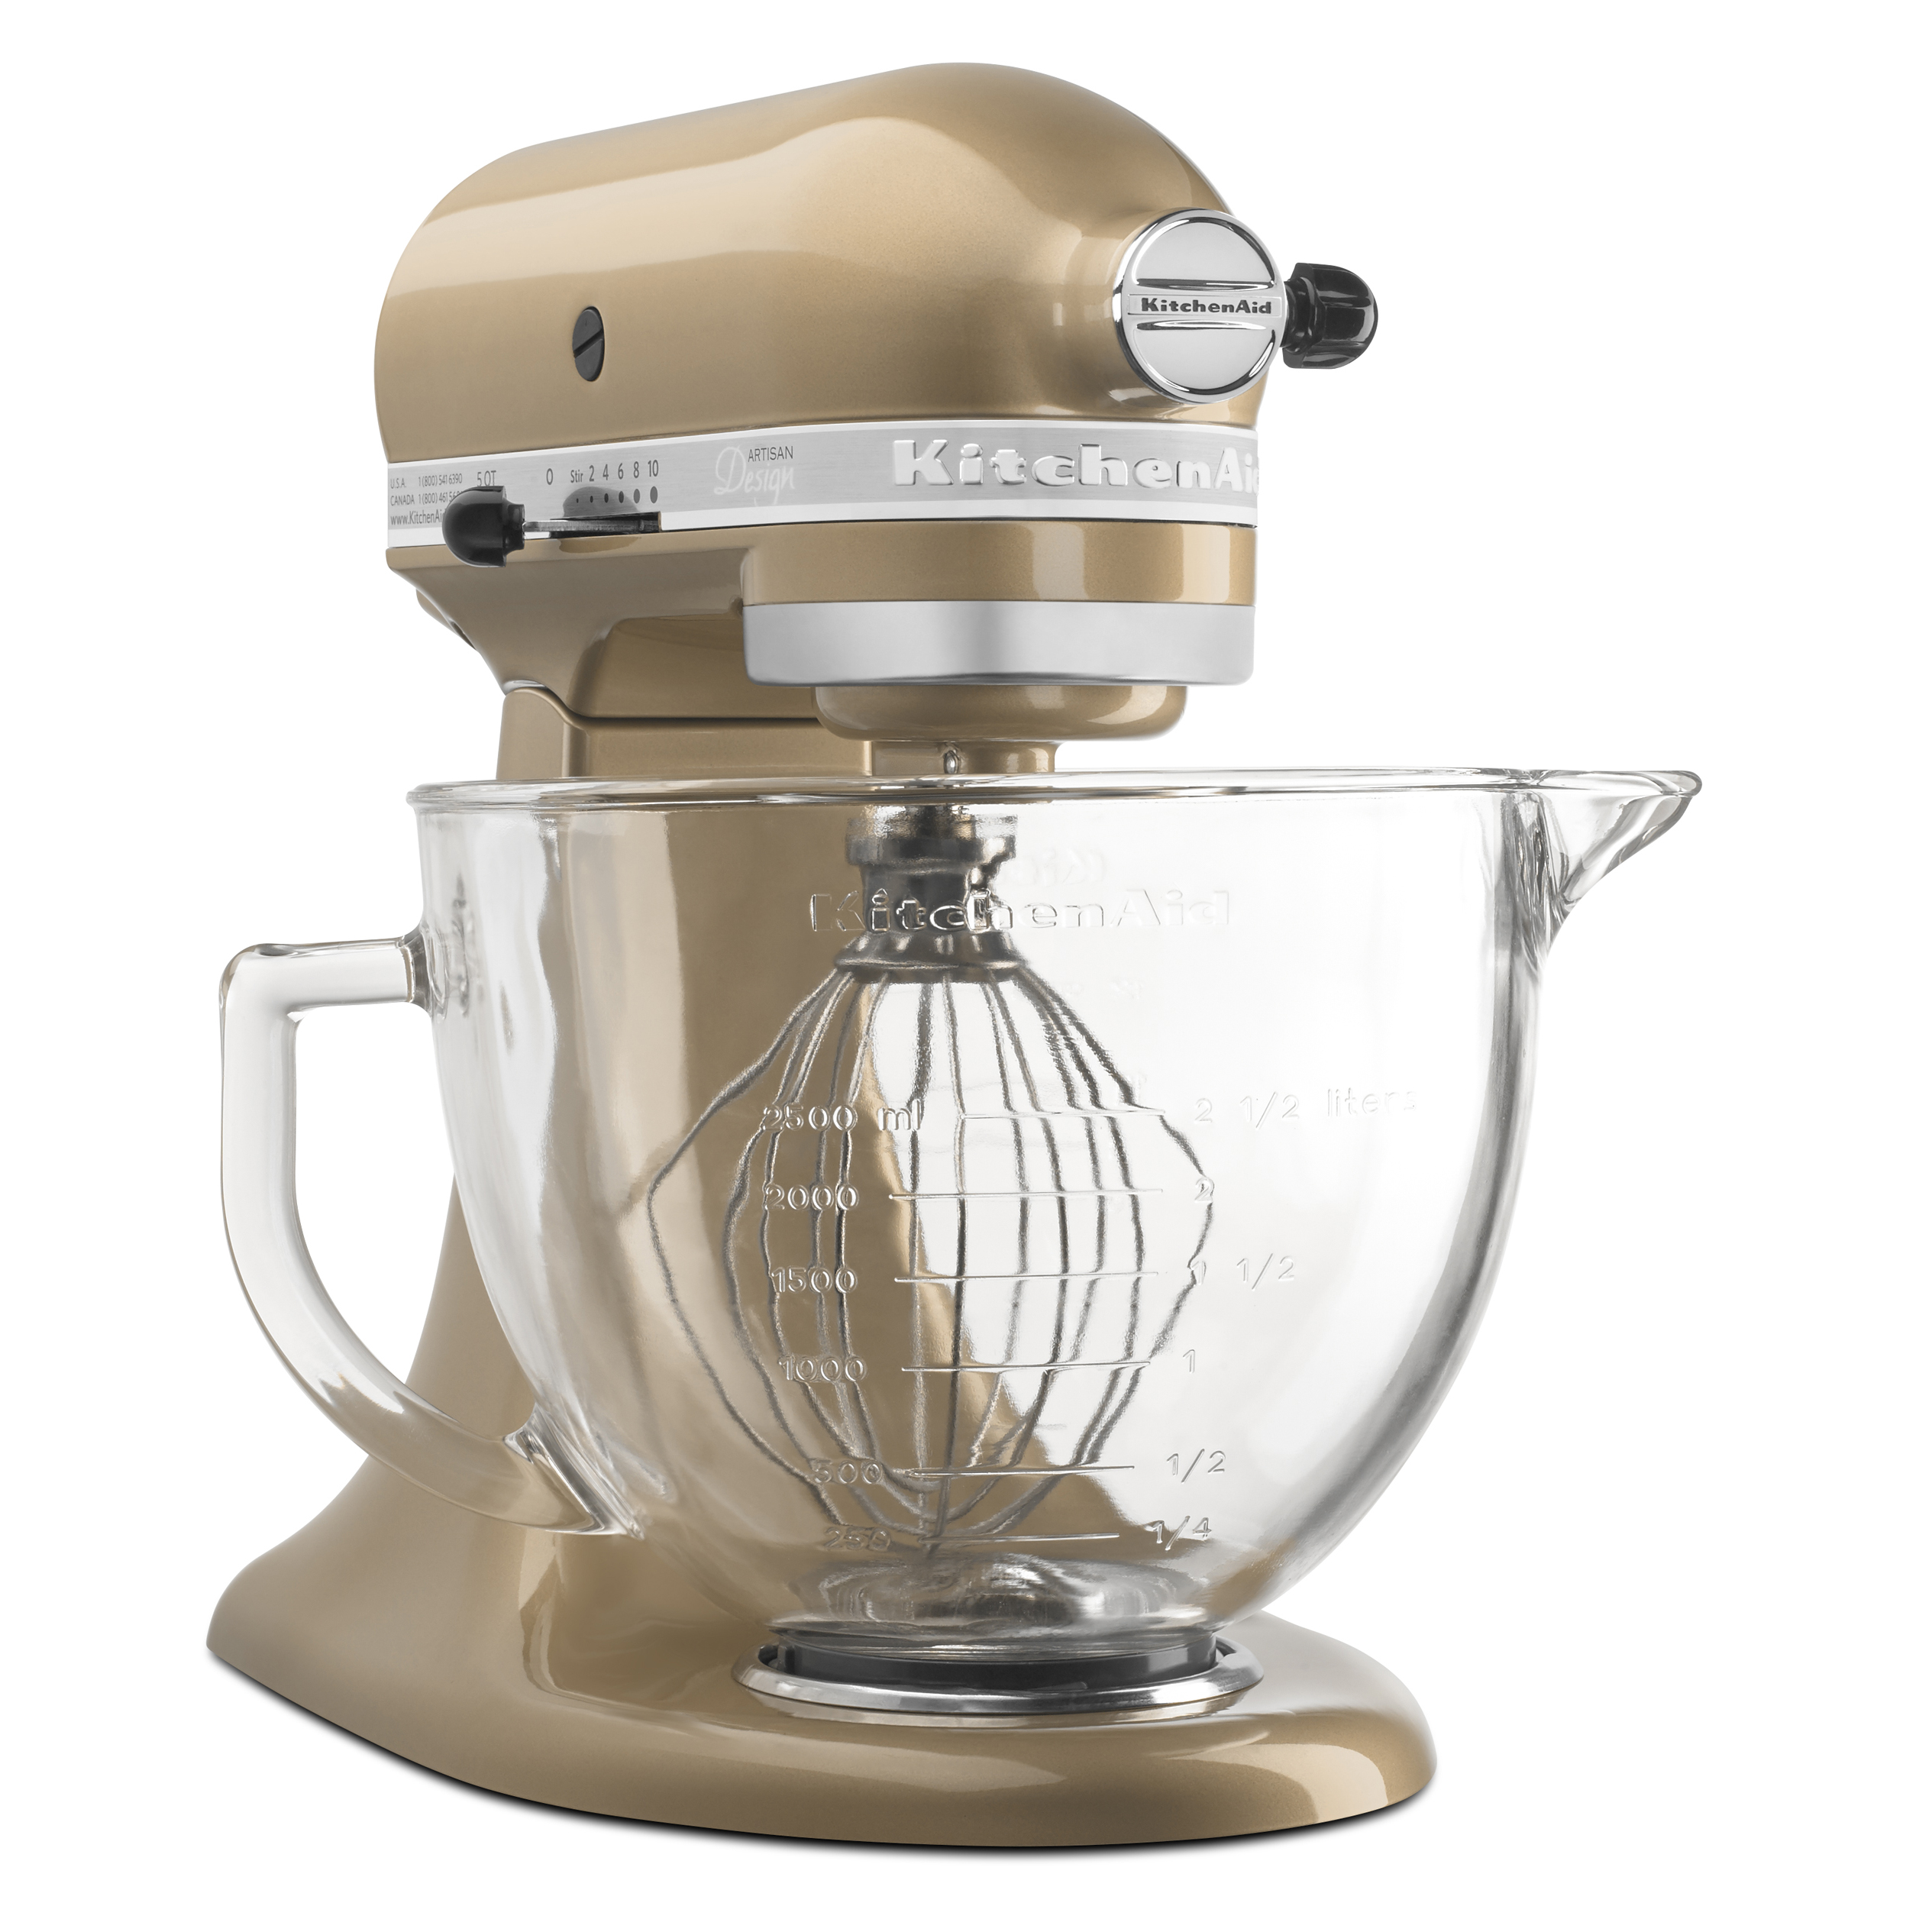 Kitchenaid Artisan Design Series 5 Quart Tilt Head Stand Mixer With Glass Bowl Champagne Closeout Walmart Com Walmart Com